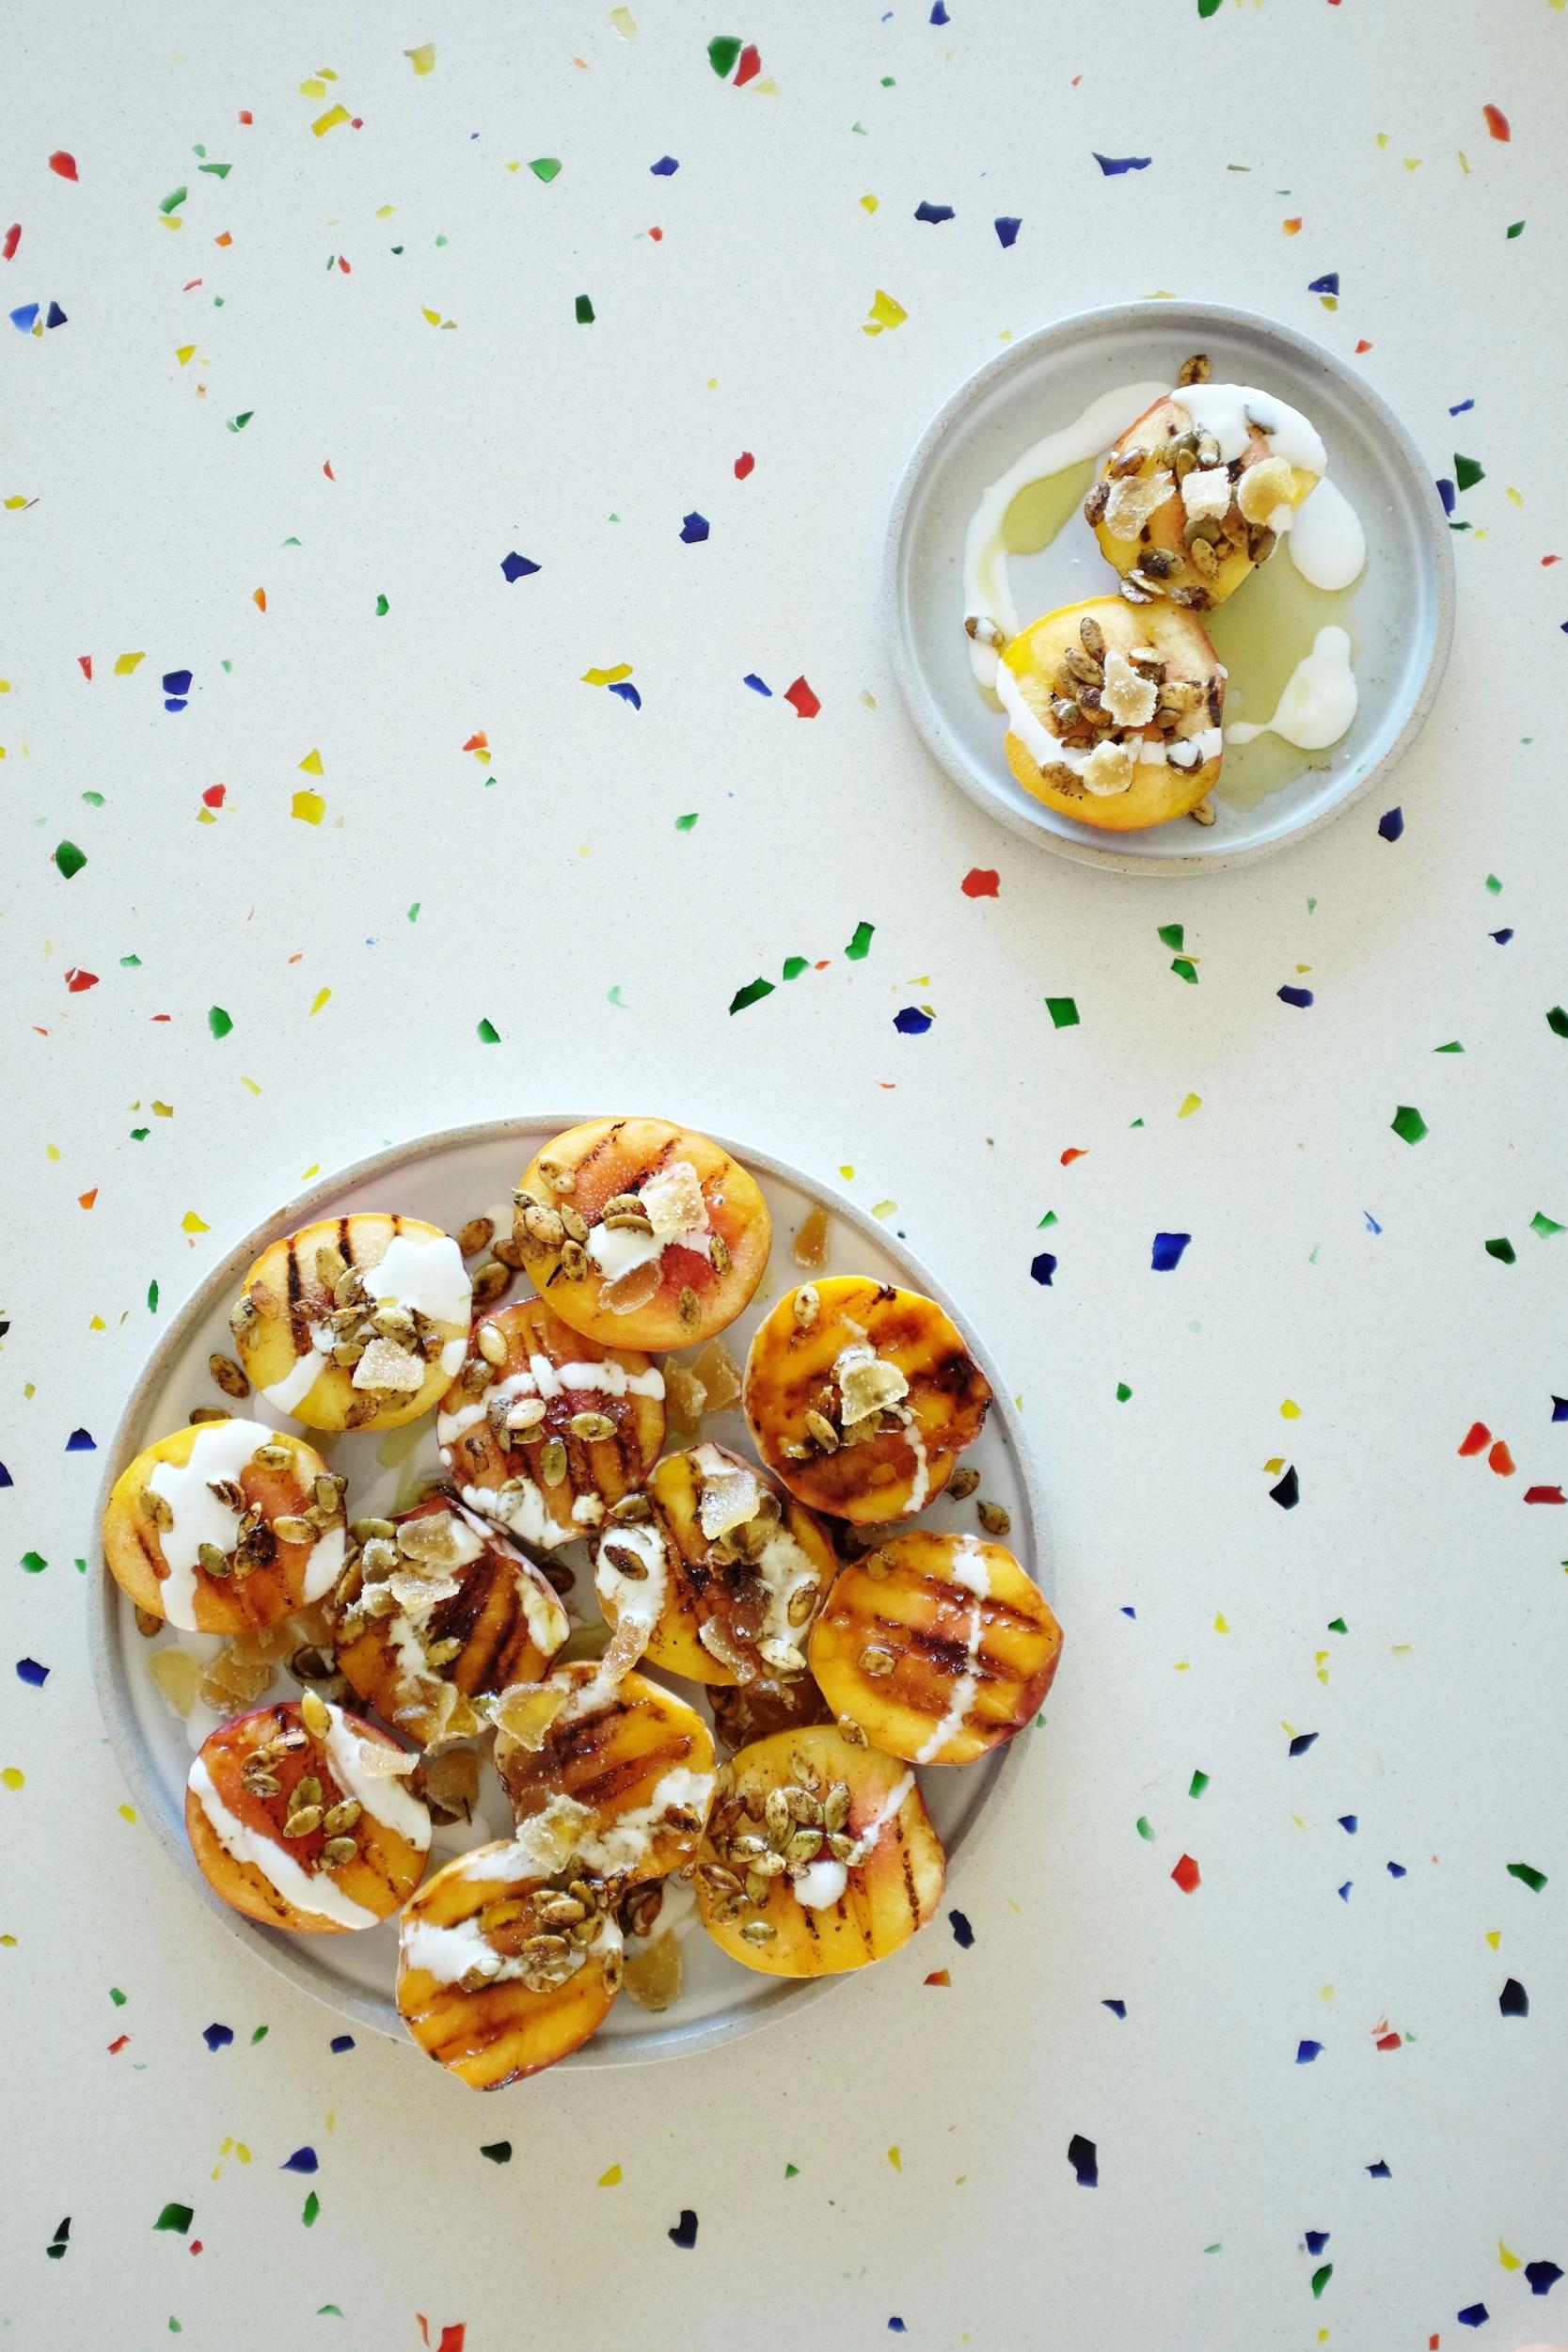 hot paprika peaches & cream.